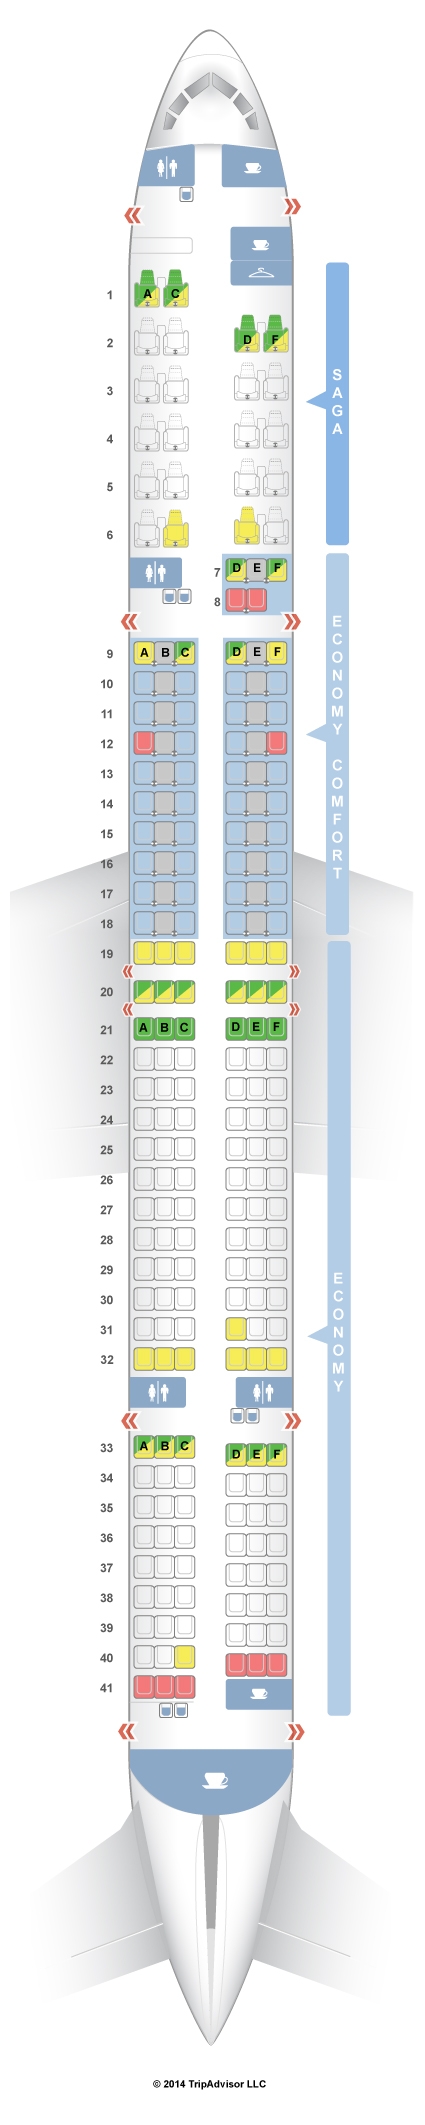 Seatguru Seat Map Icelandair Boeing 757 300 753